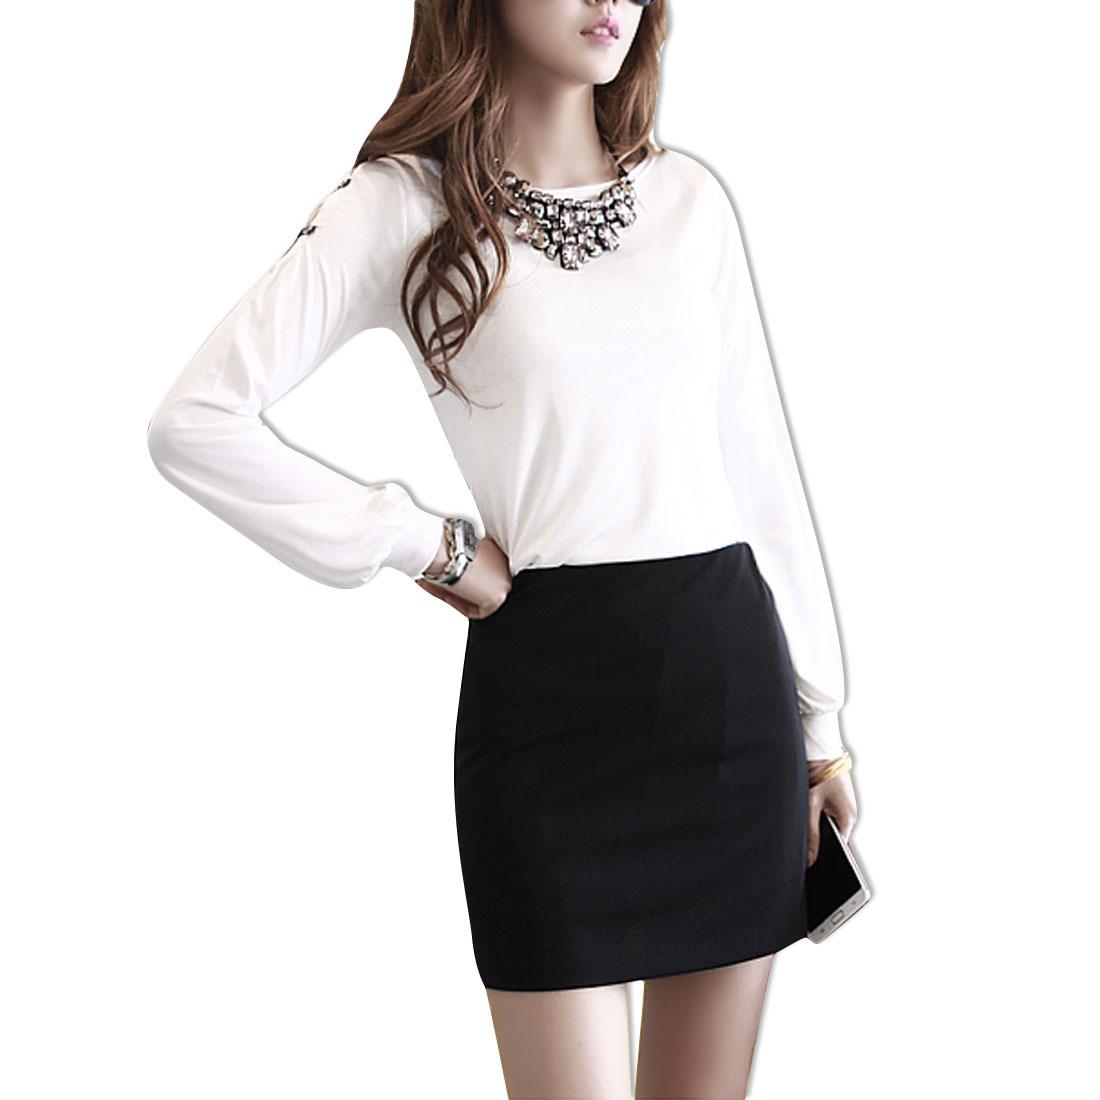 Women Rivet Shoulder Long Sleeves White Slim Fit Top Shirt XS